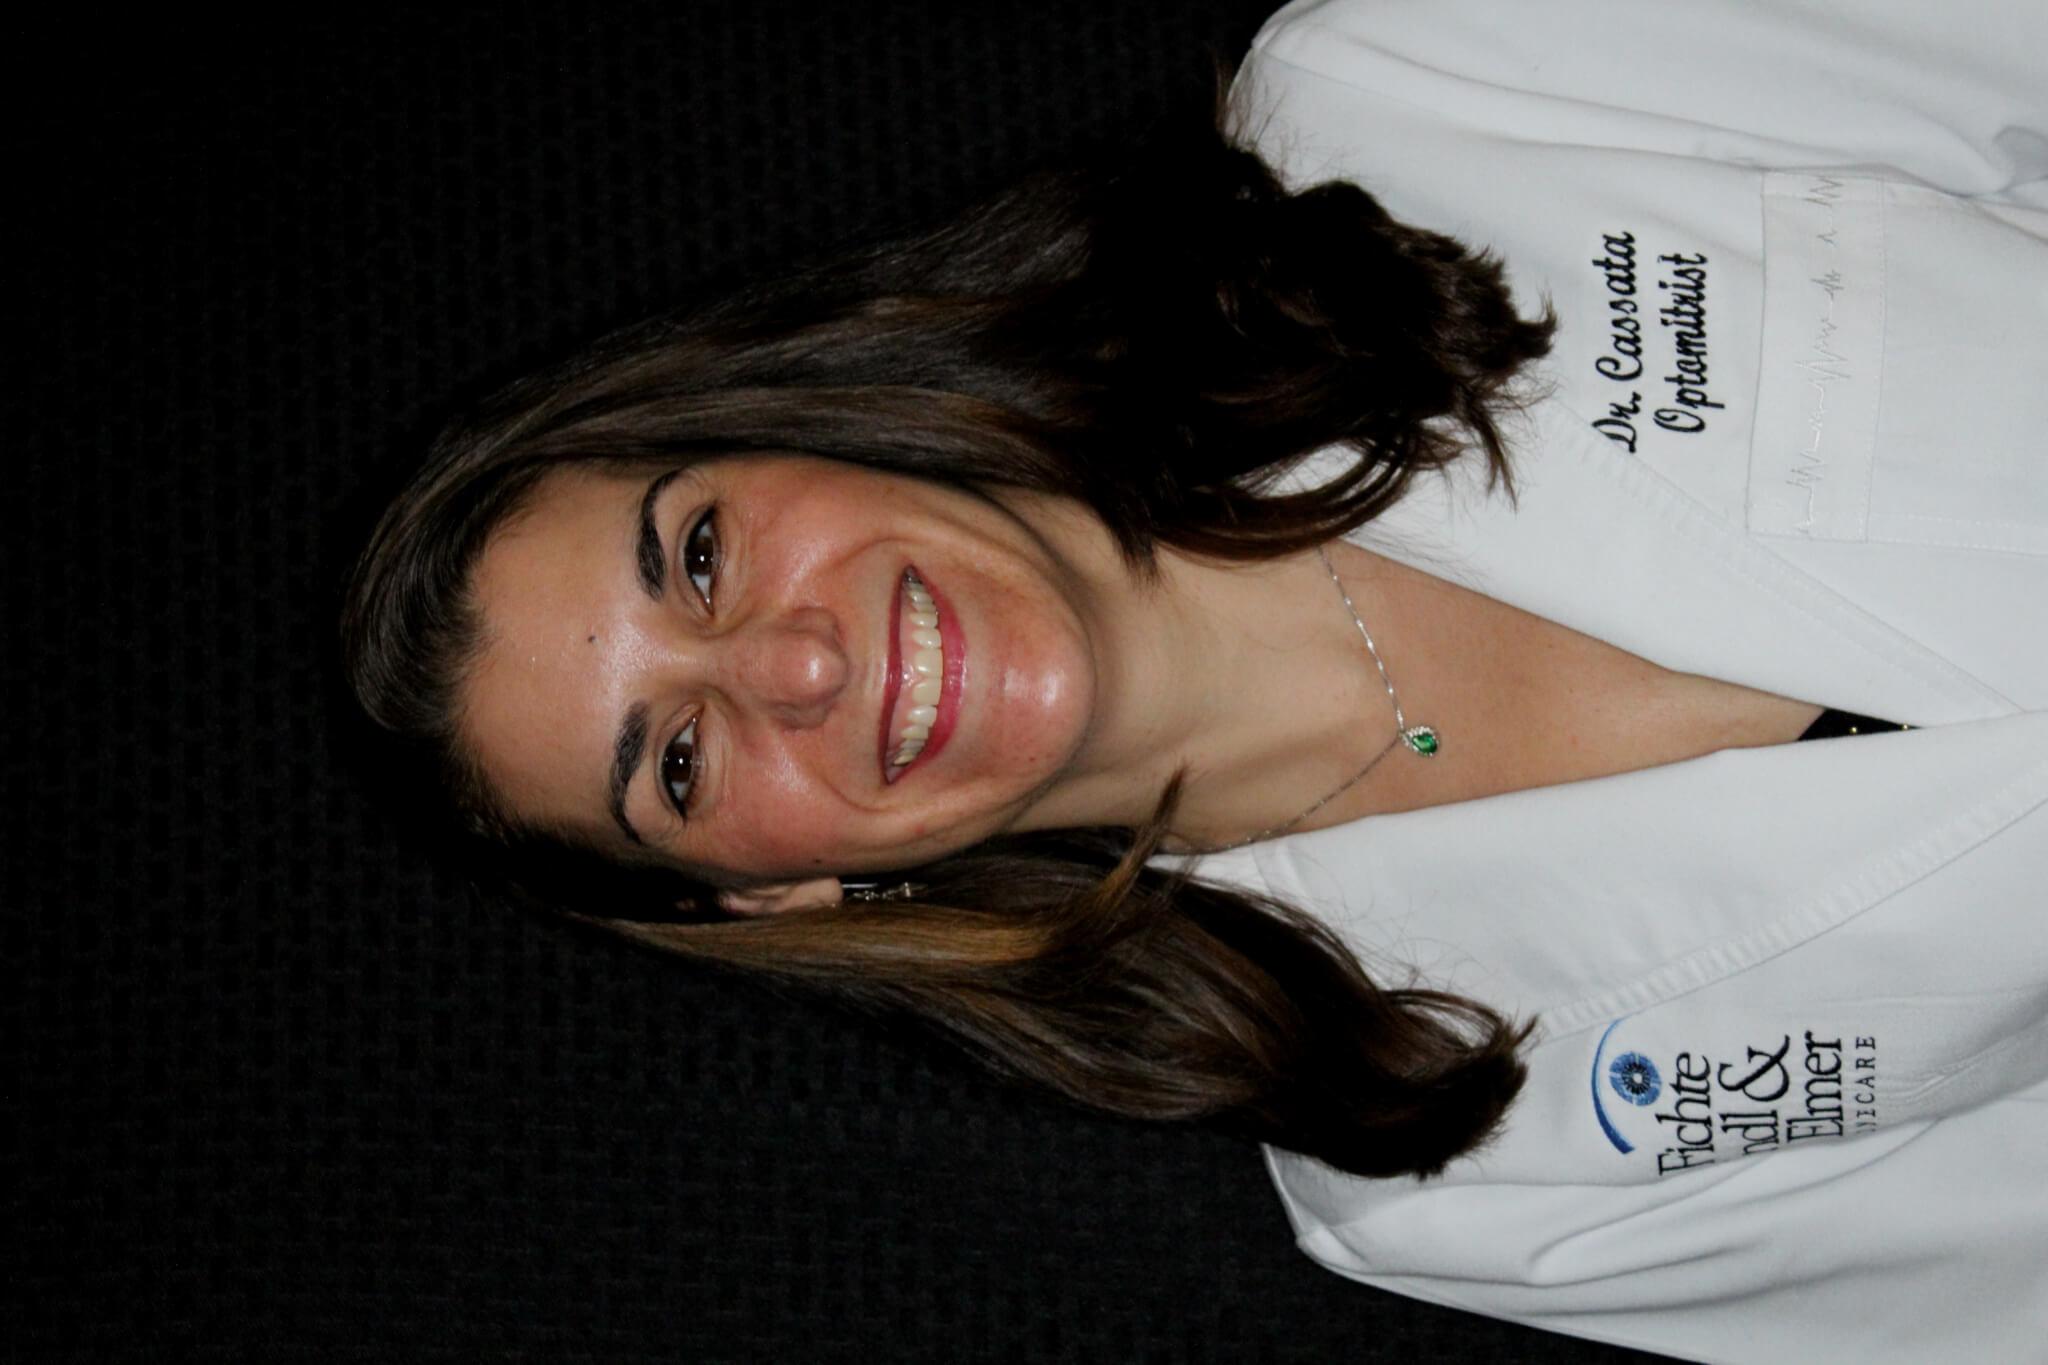 Dr. Adrienne M. Cassata O.D.